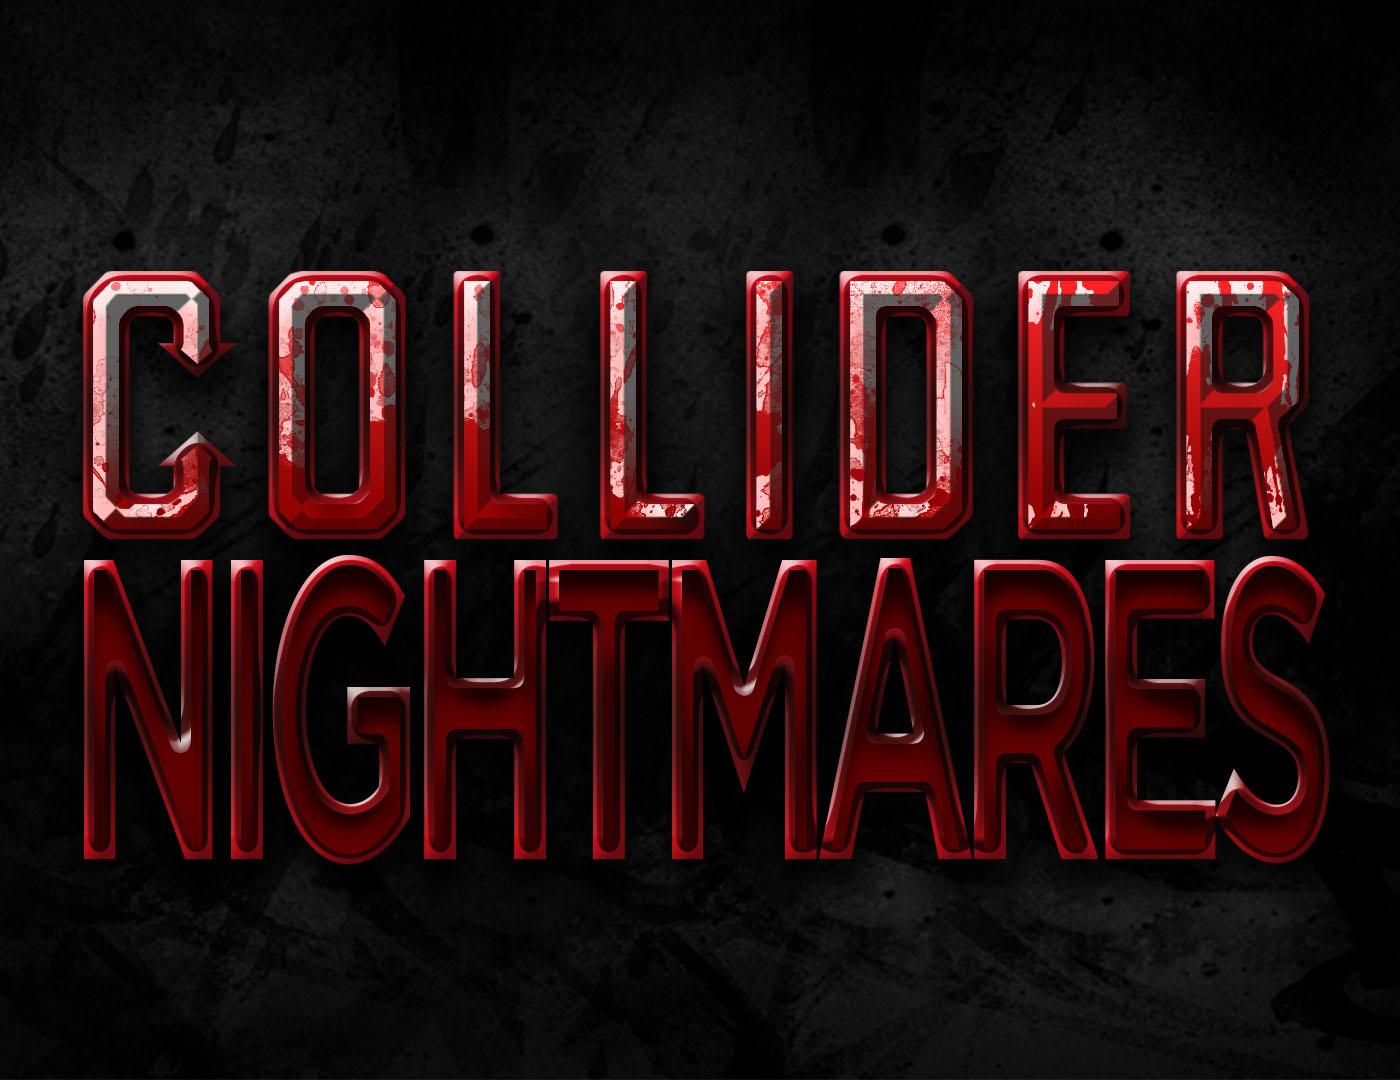 Alien 5 Chances Slim, Resident Evil Director Paul WS Anderson In Studio - Collider Nightmares